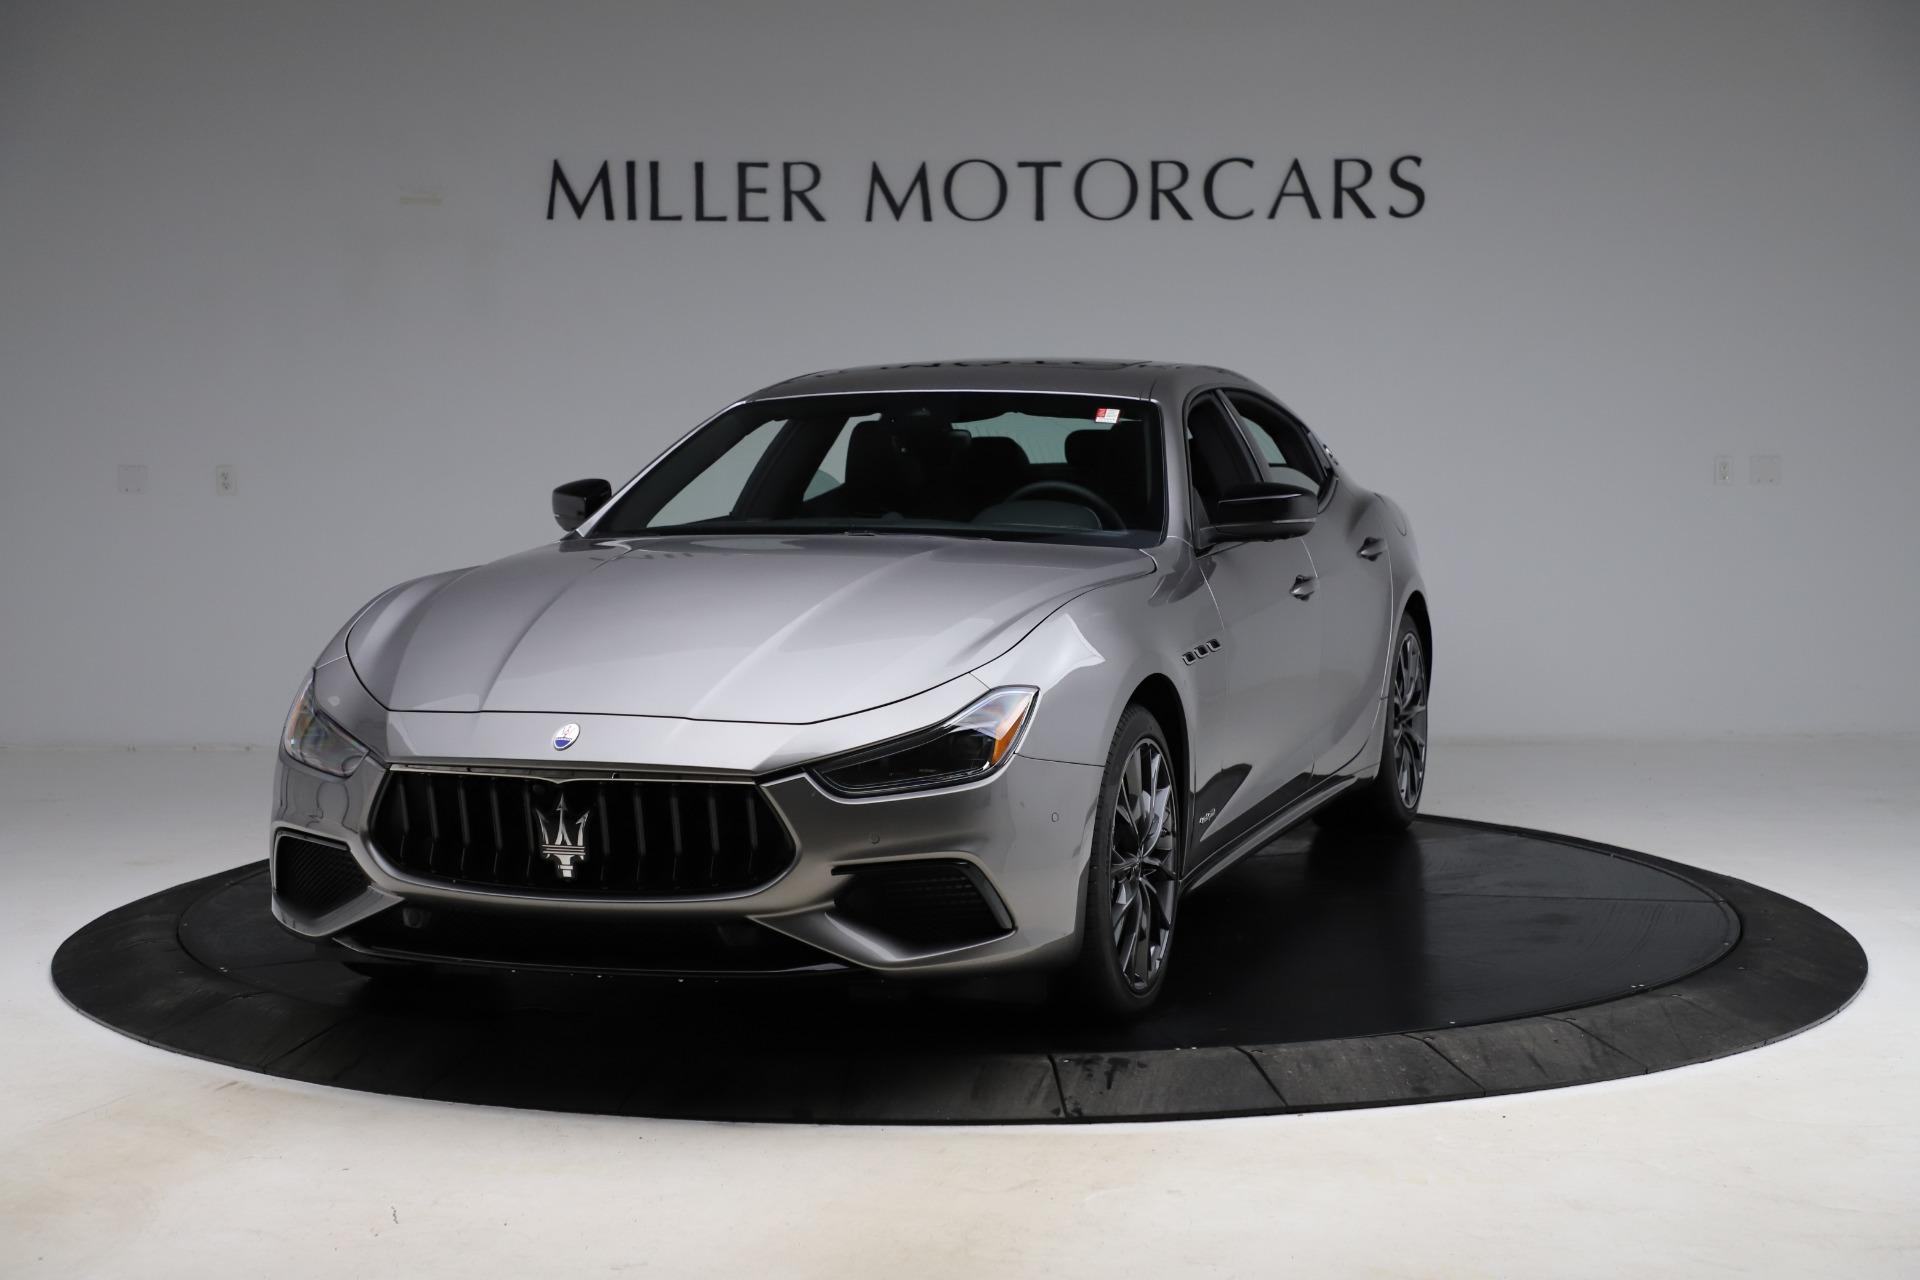 New 2021 Maserati Ghibli S Q4 GranSport for sale $98,125 at Maserati of Greenwich in Greenwich CT 06830 1